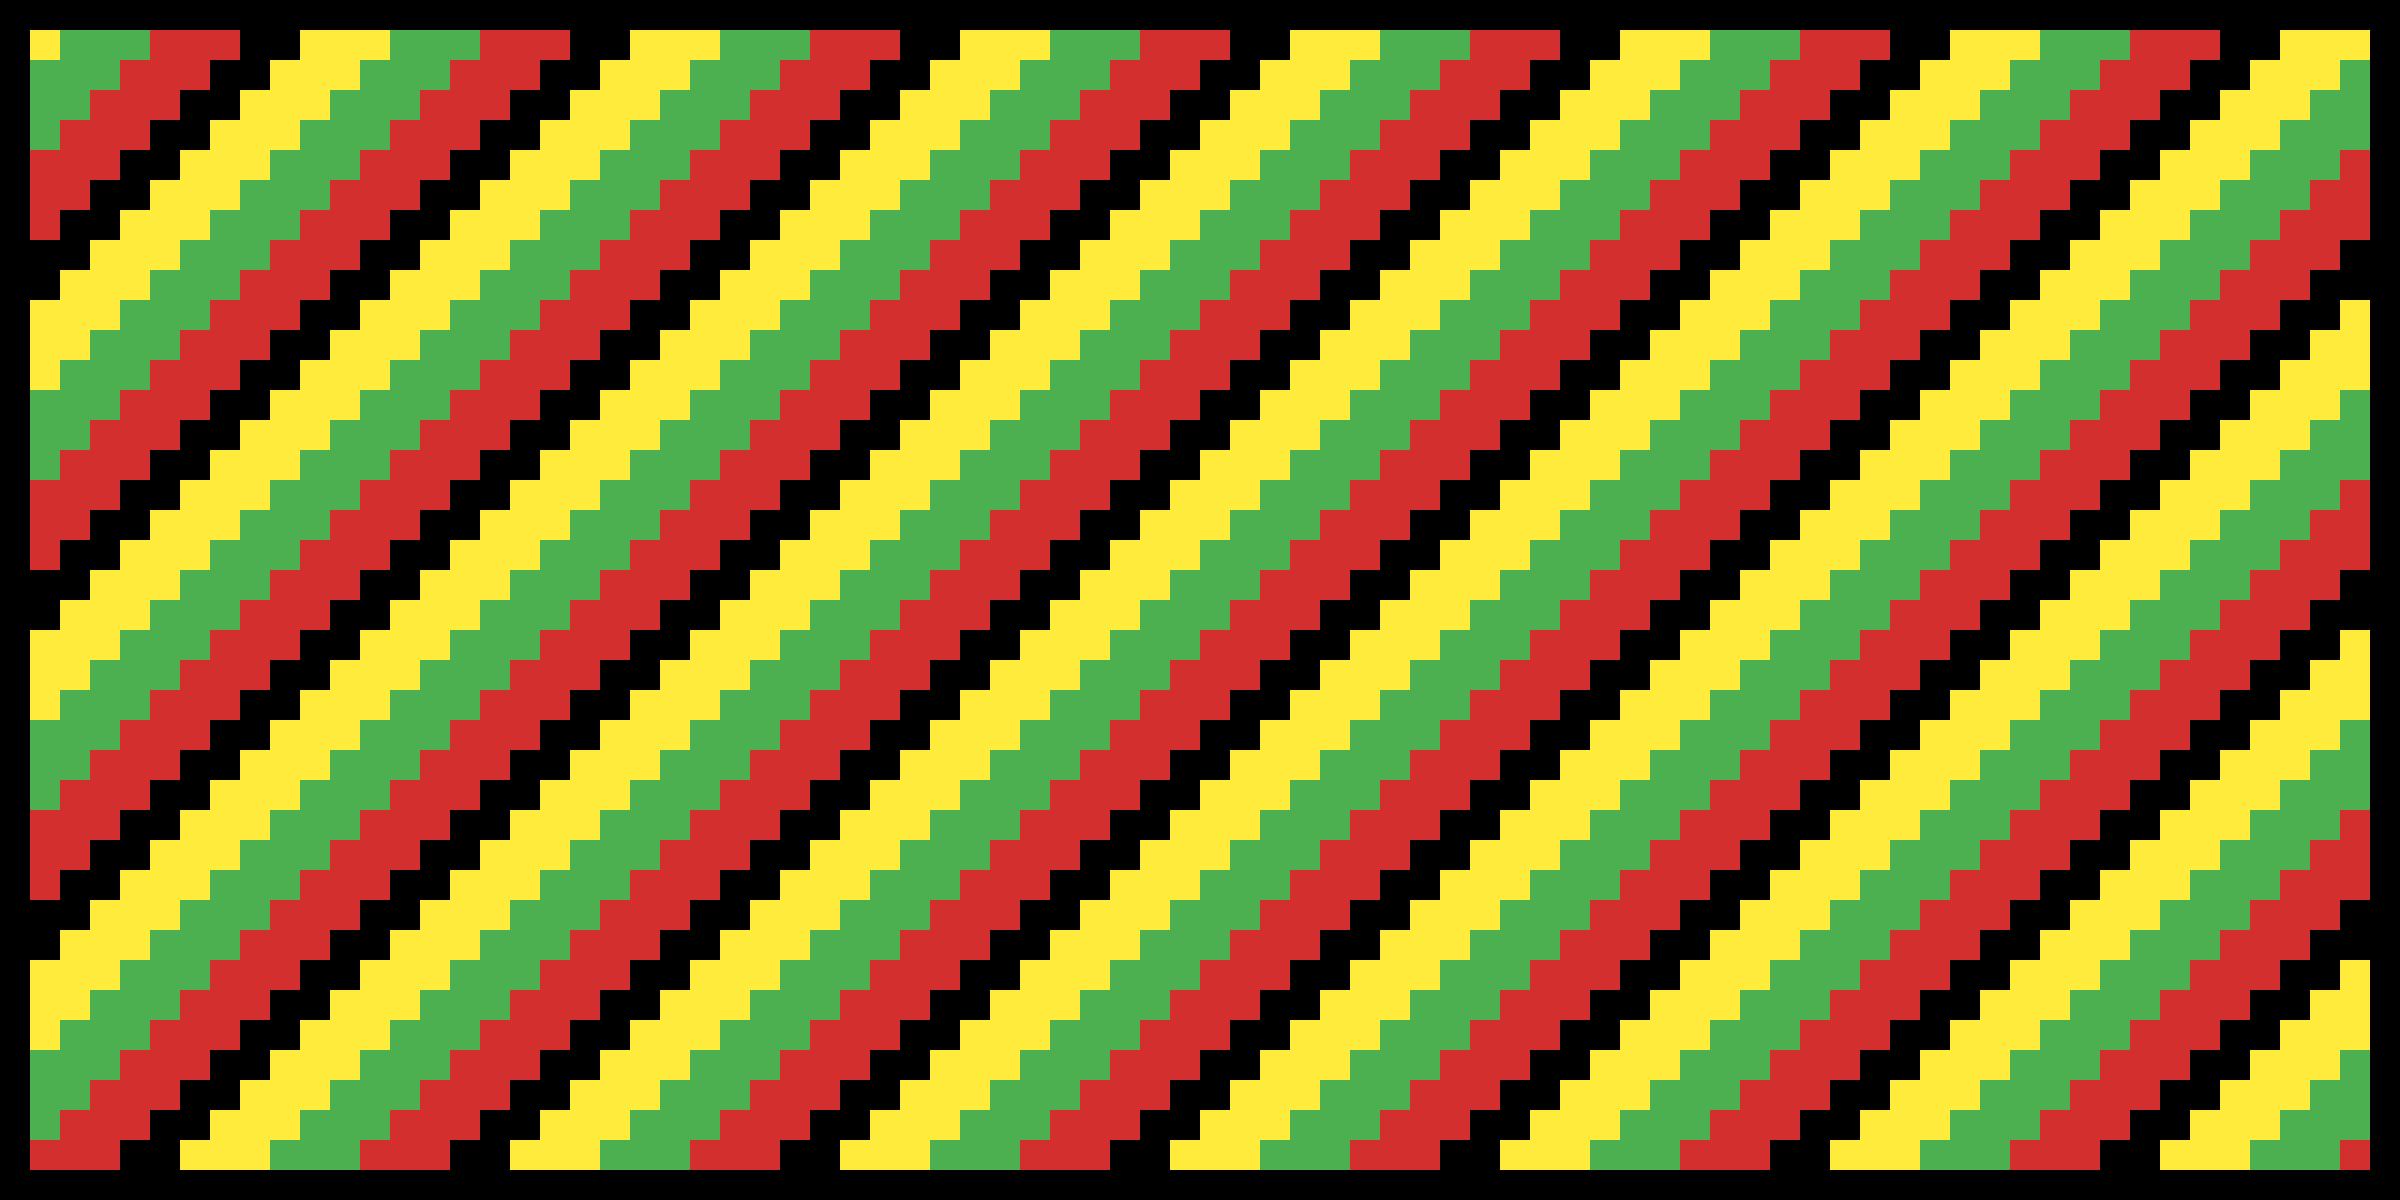 pixil-frame-0-1